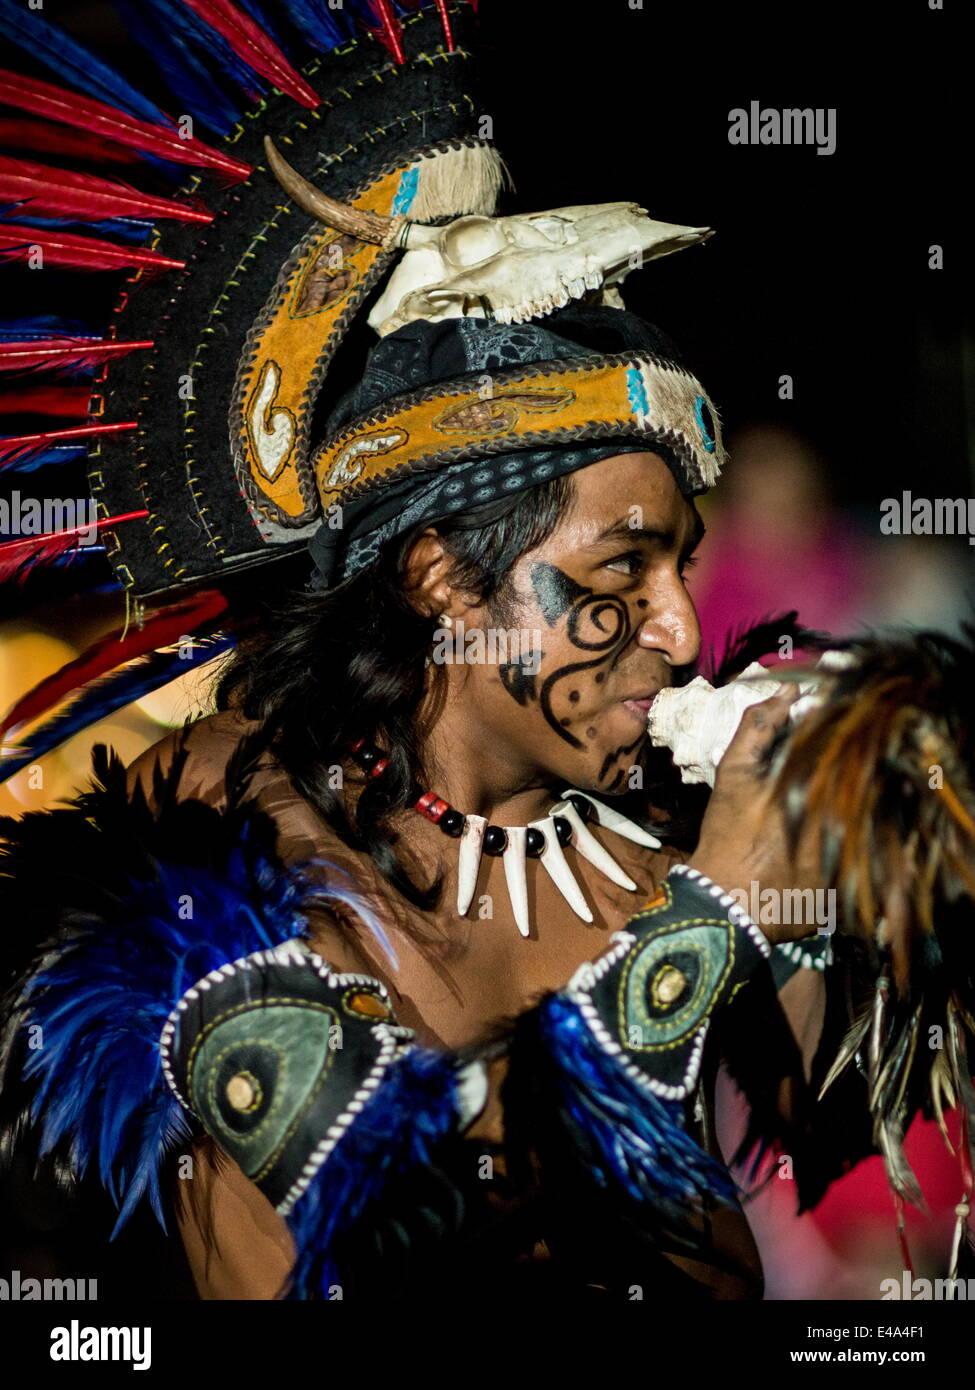 Encuento Nacional de Danza Espectáculo Cultural Mexica, Cholula, estado de Puebla, México, América Imagen De Stock